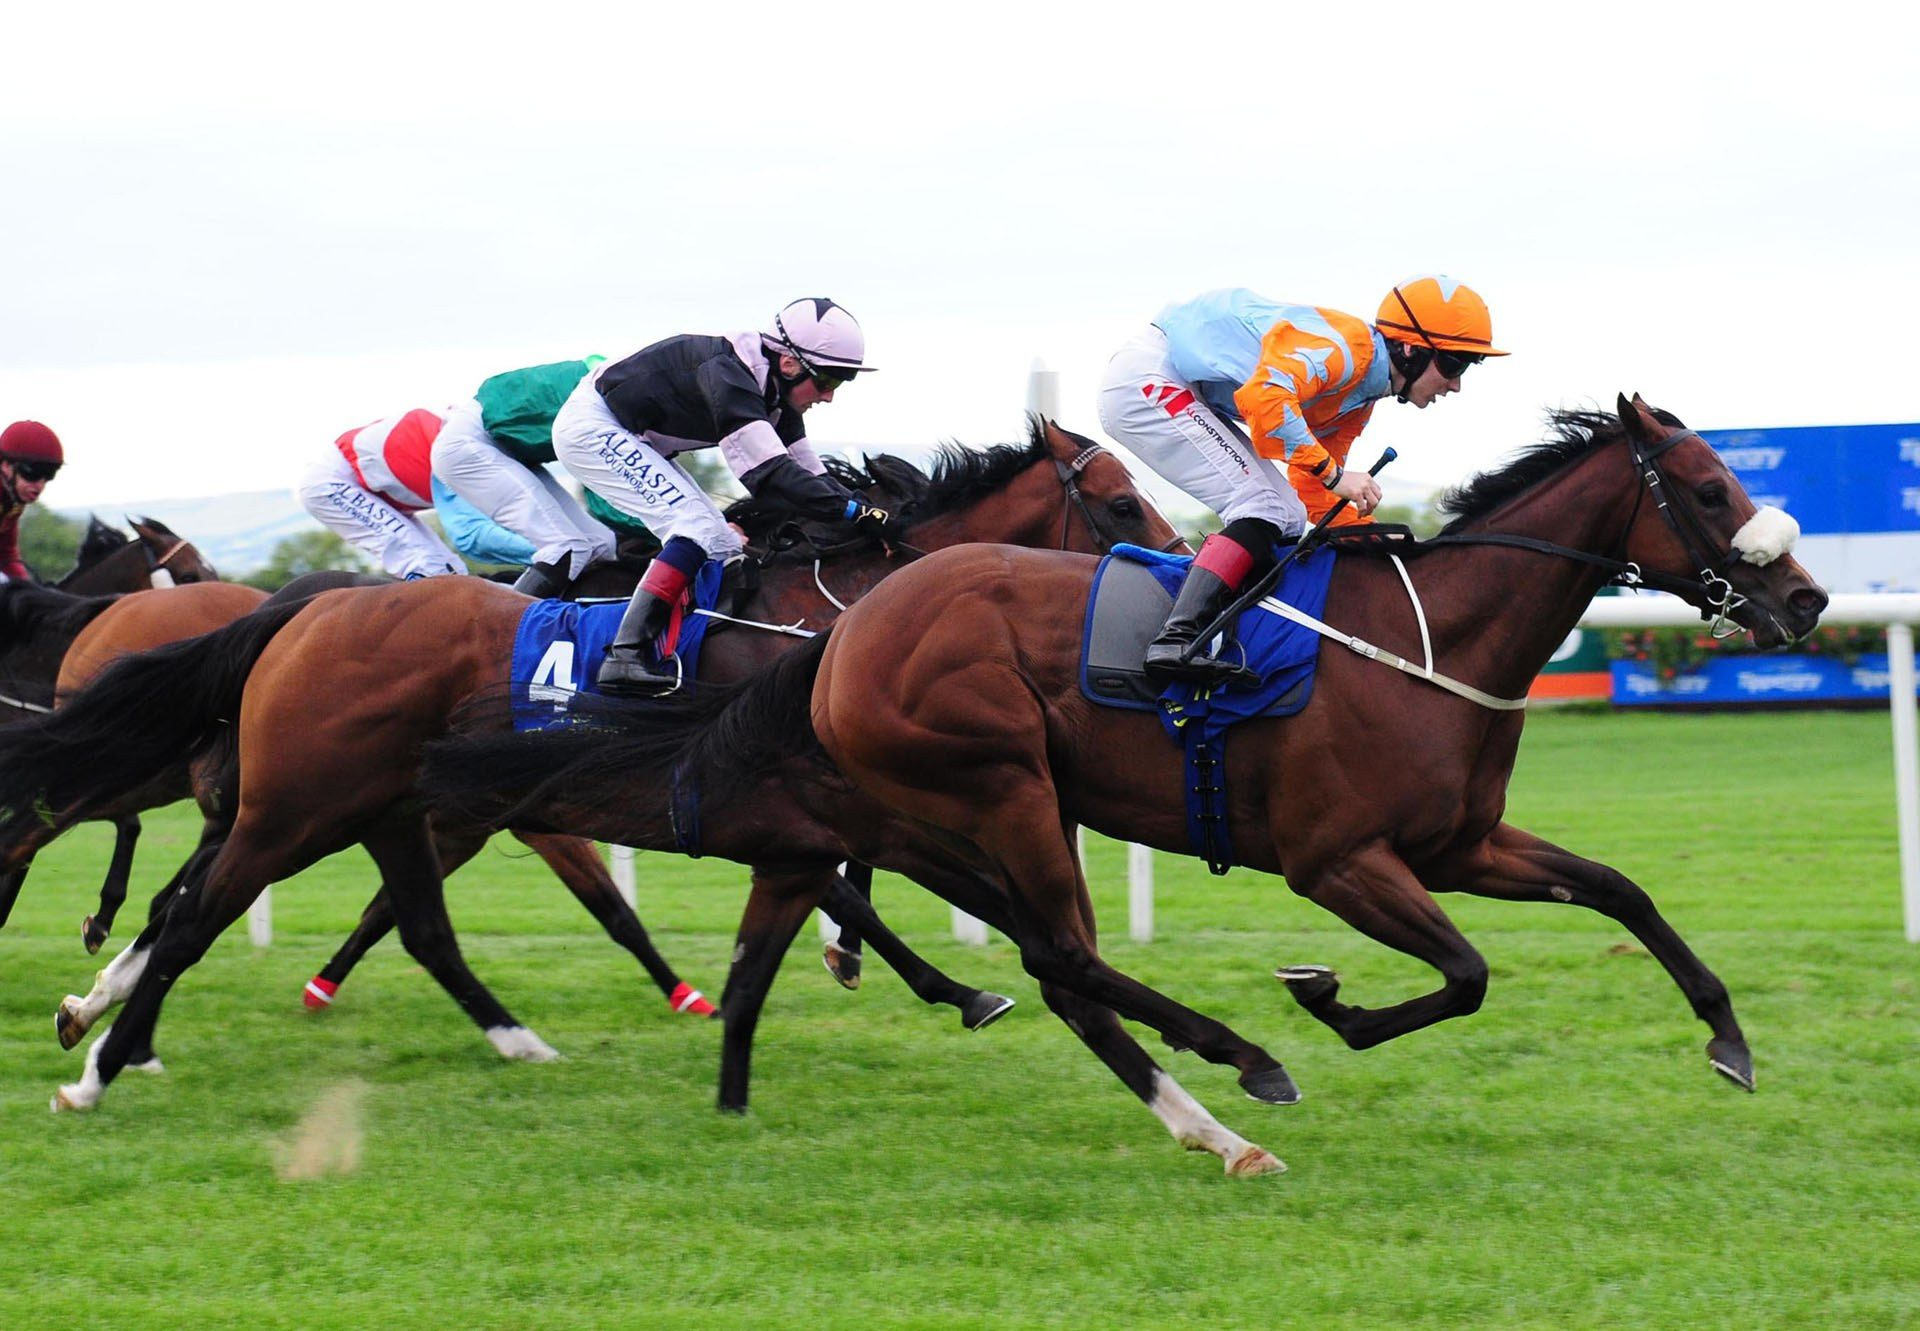 Blue Uluru (Choisir) winning the Listed Abergwaun Stakes at Tipperary